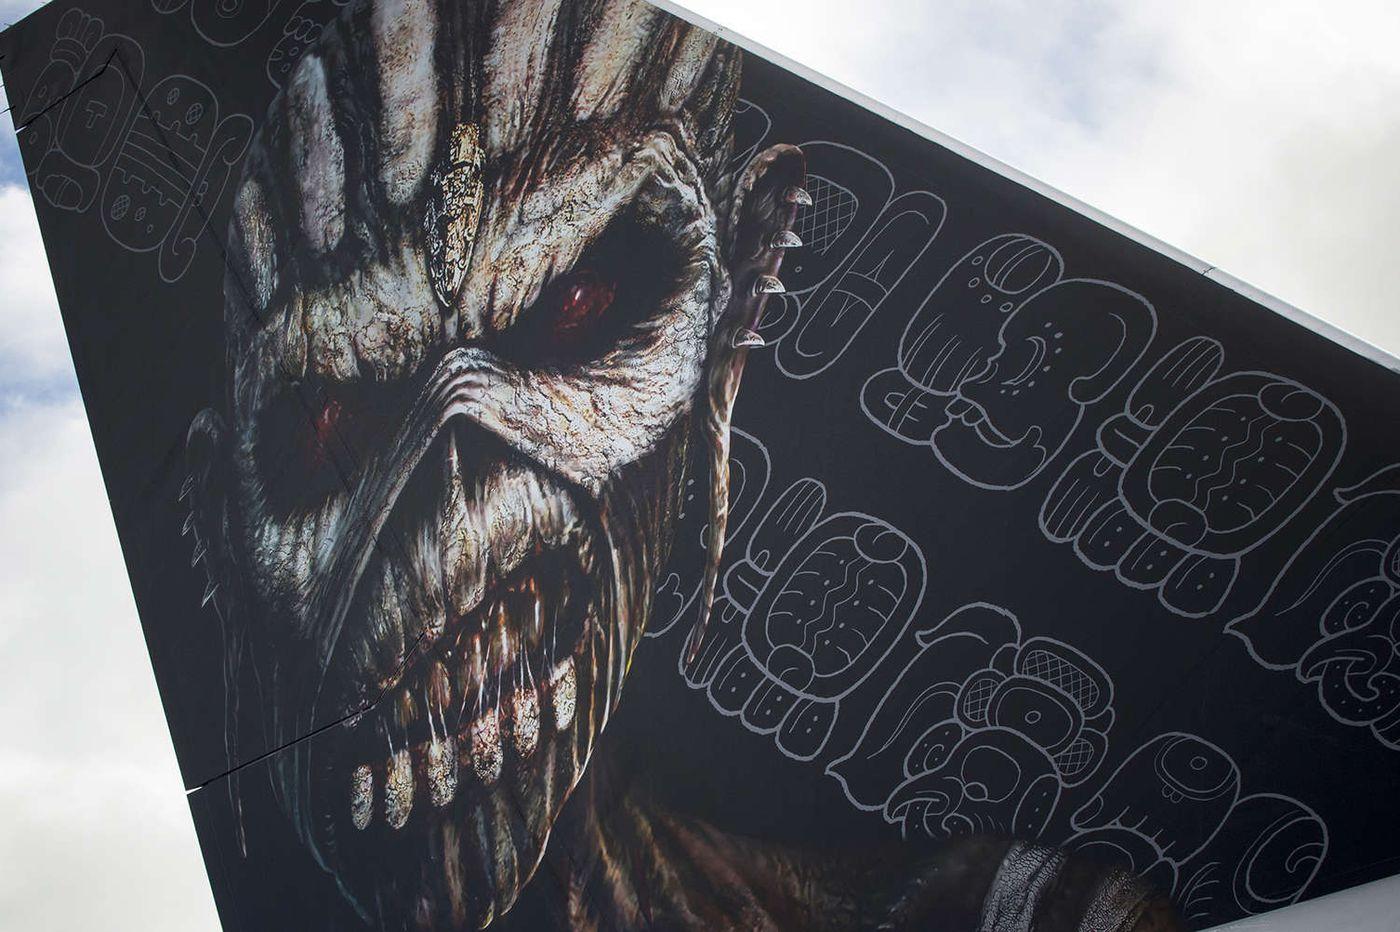 Penn archaeologist helps with Iron Maiden tour logo